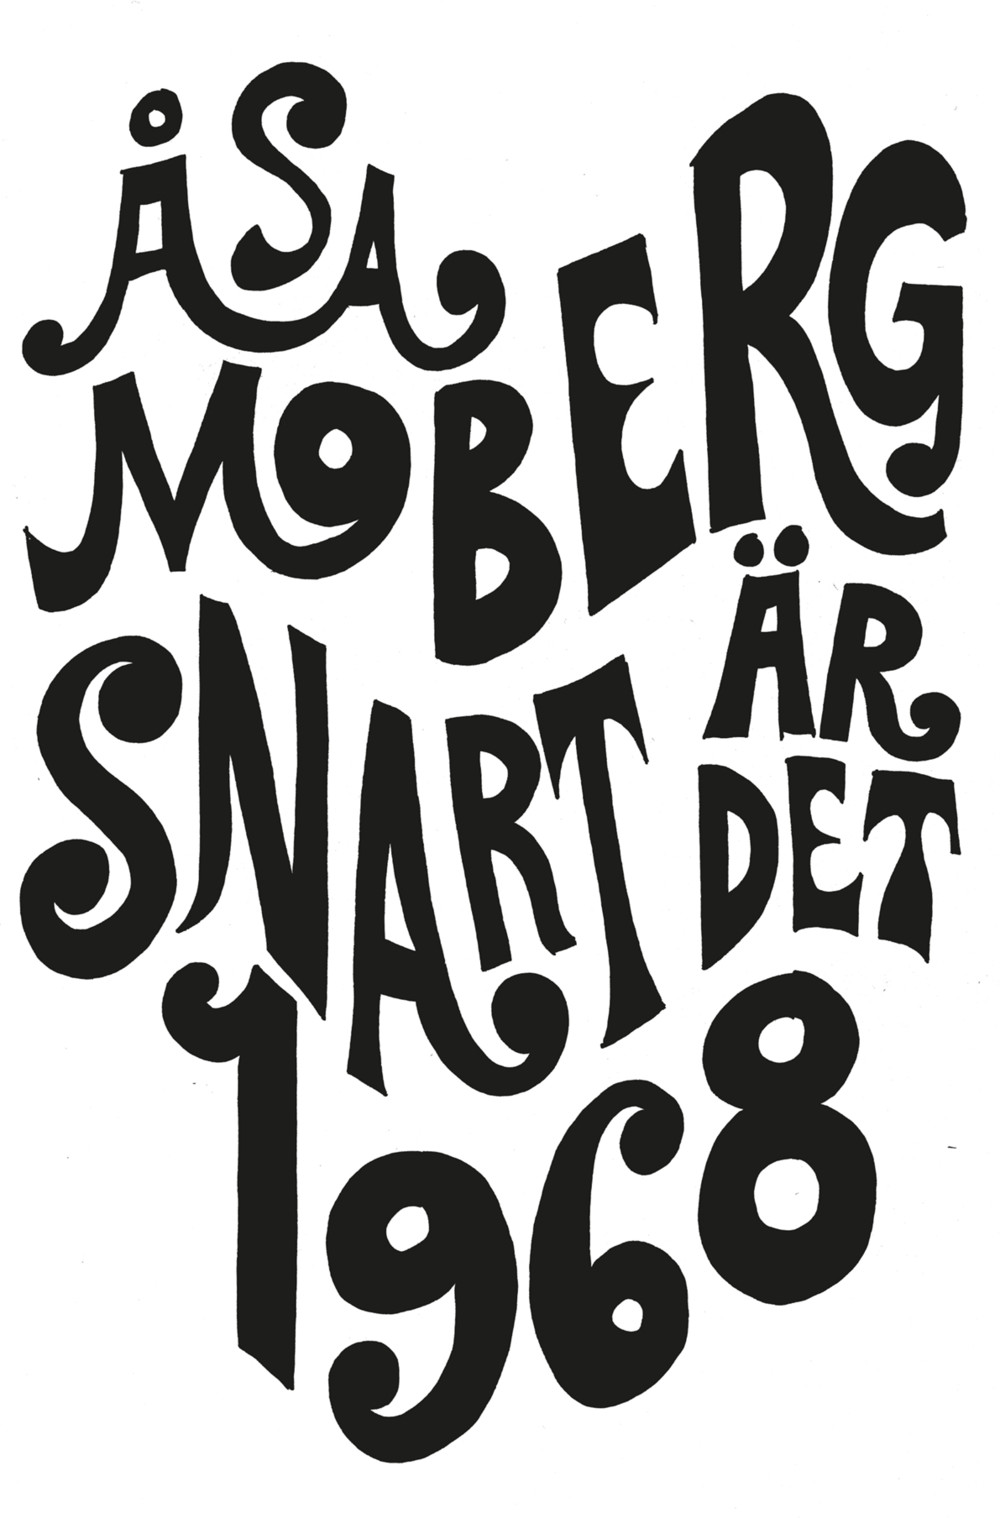 1968 var